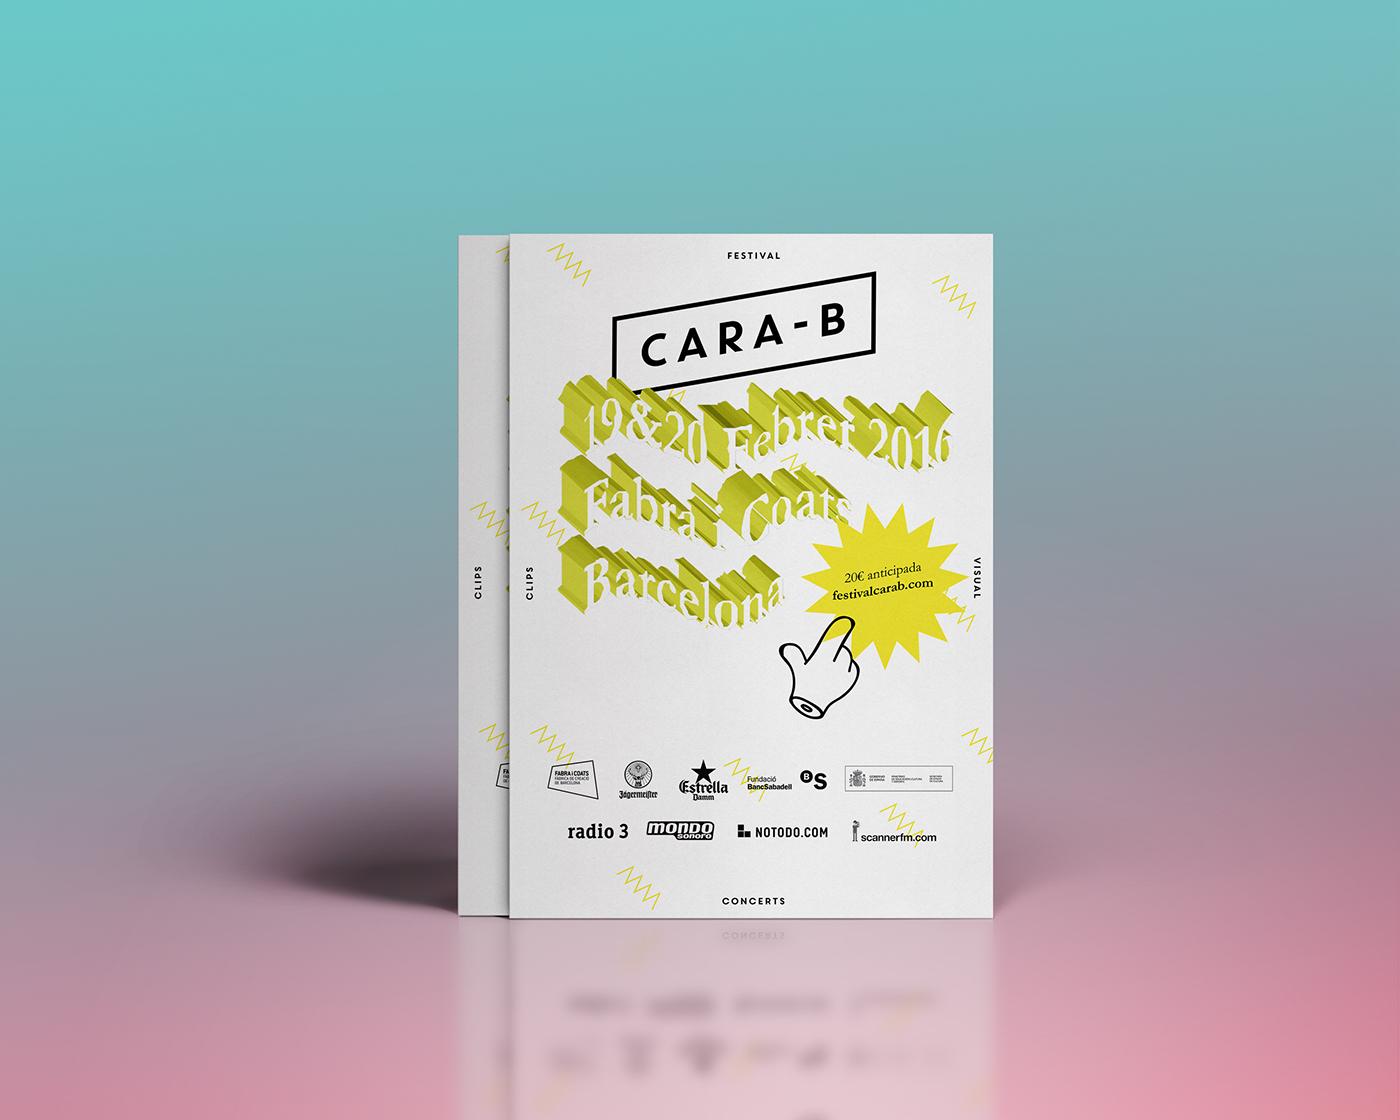 festival music art barcelona Cara-B